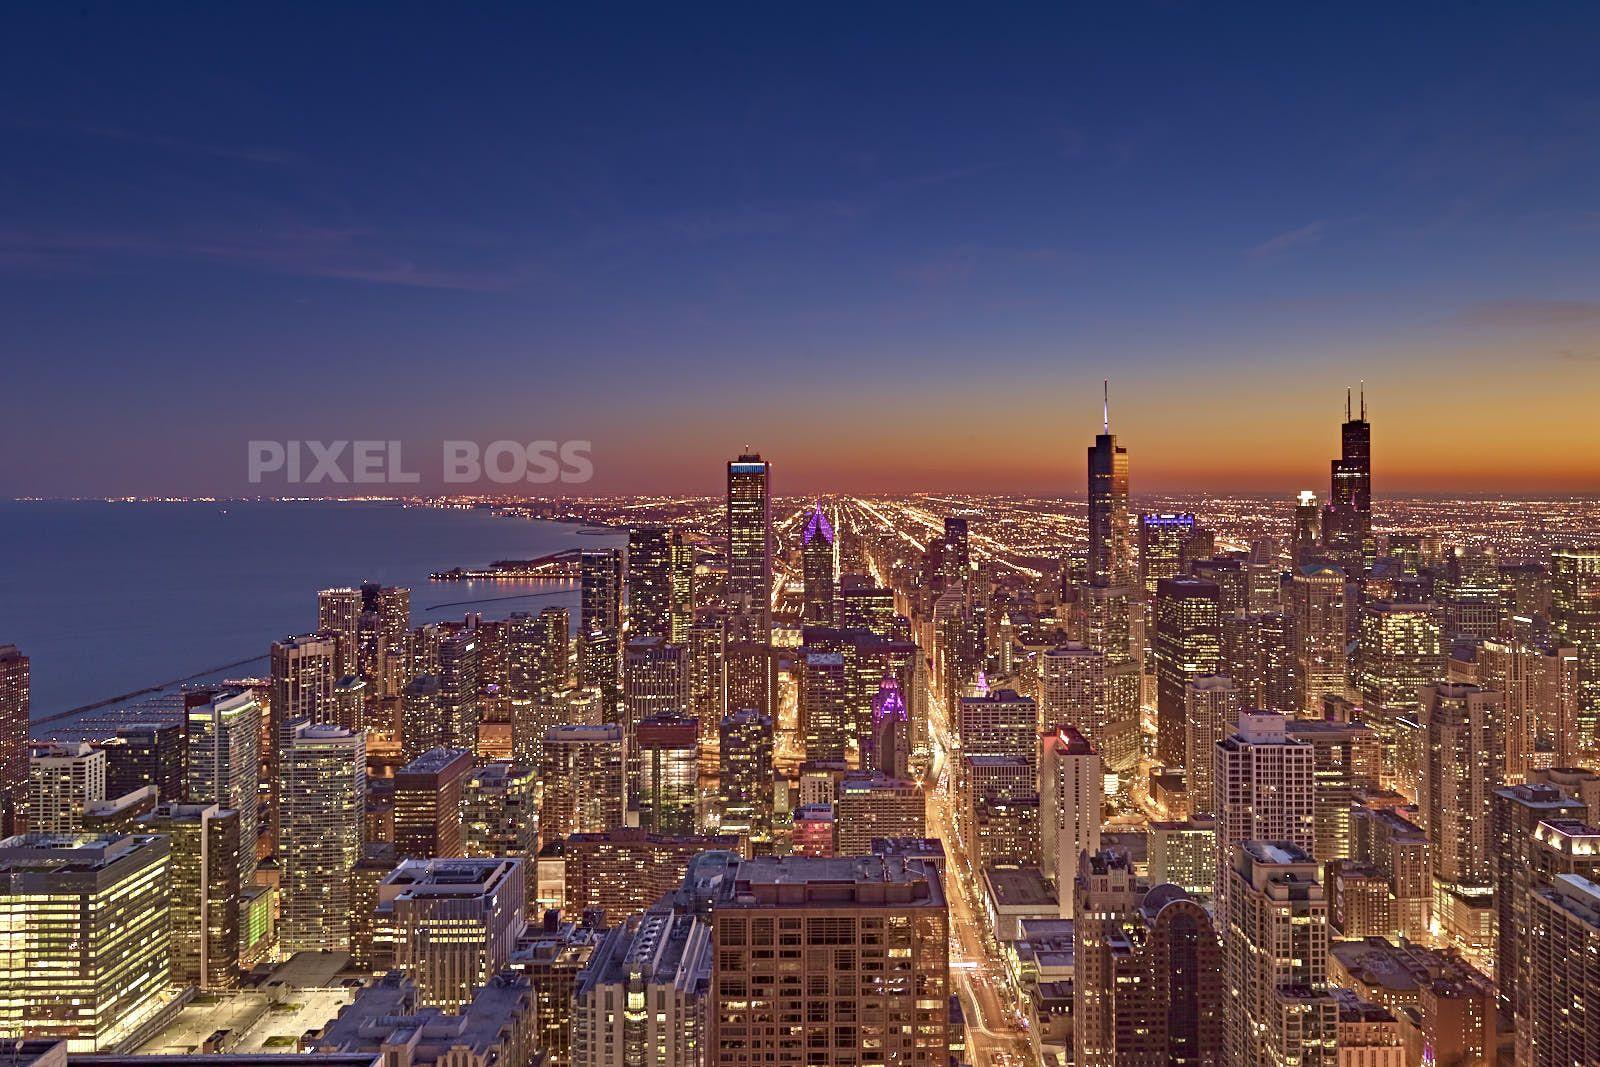 Pixel Boss Stock Photography Landscape Photography Lake Sunset Landscape